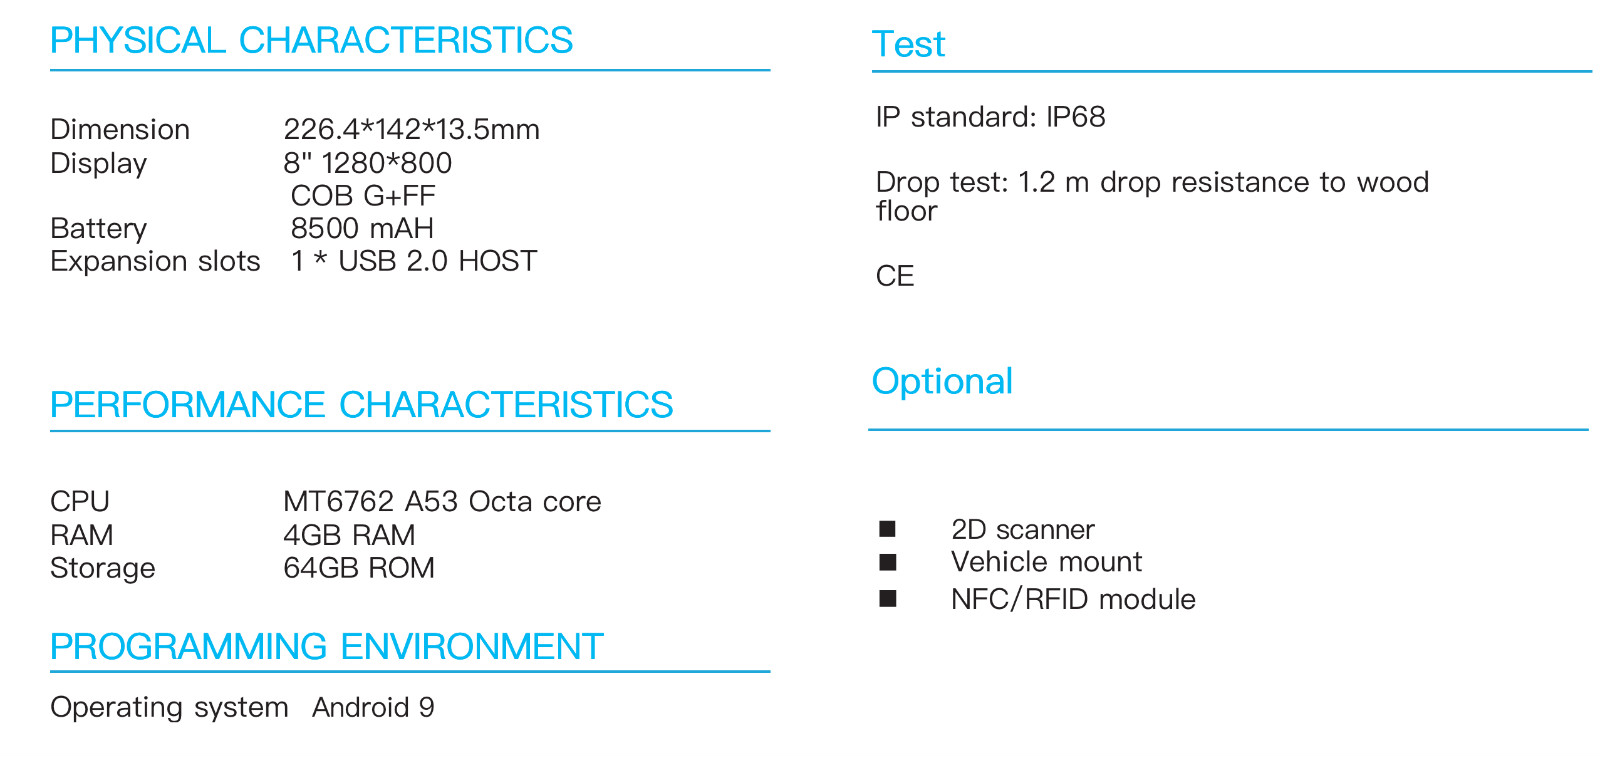 Robust Tablet RuggedT T2S